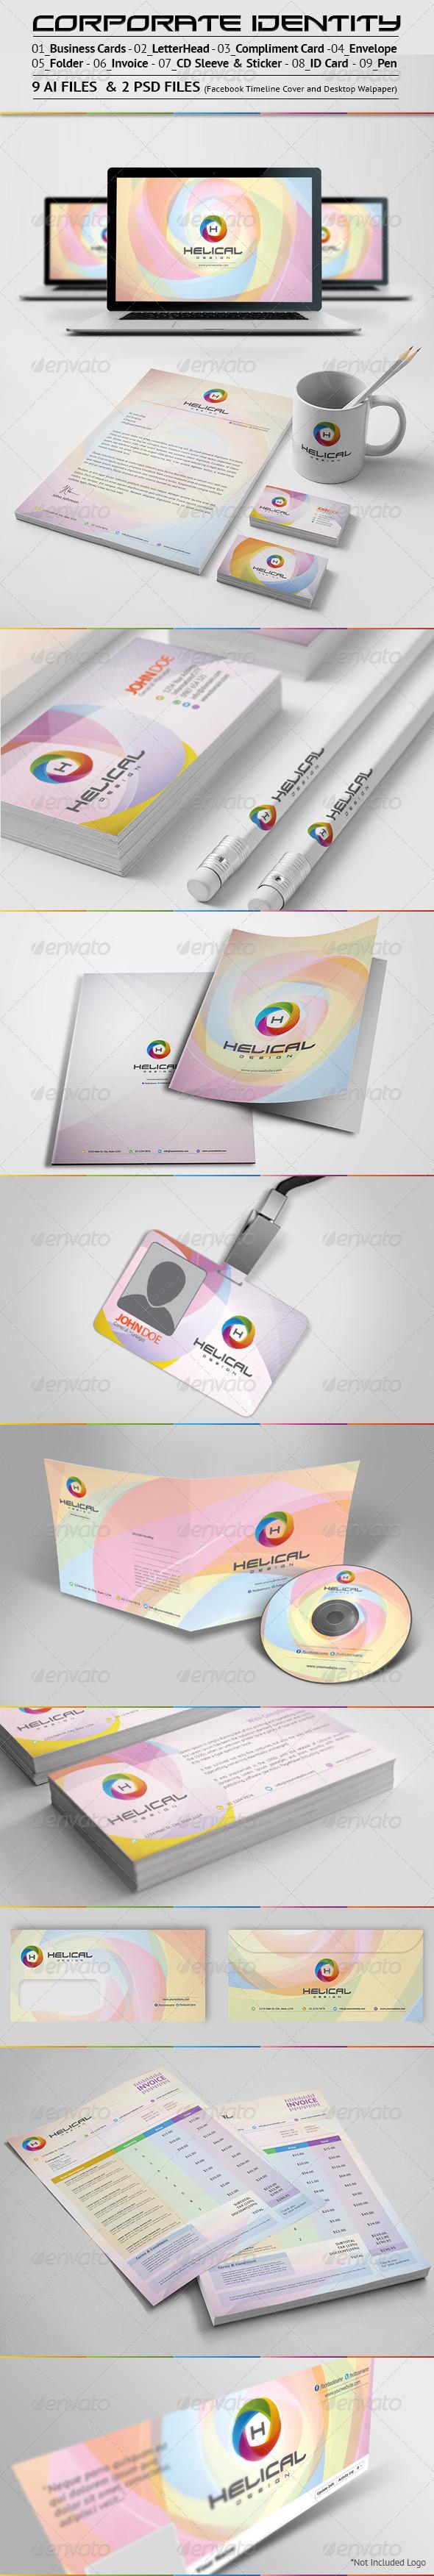 Corporate Identity Branding Pack